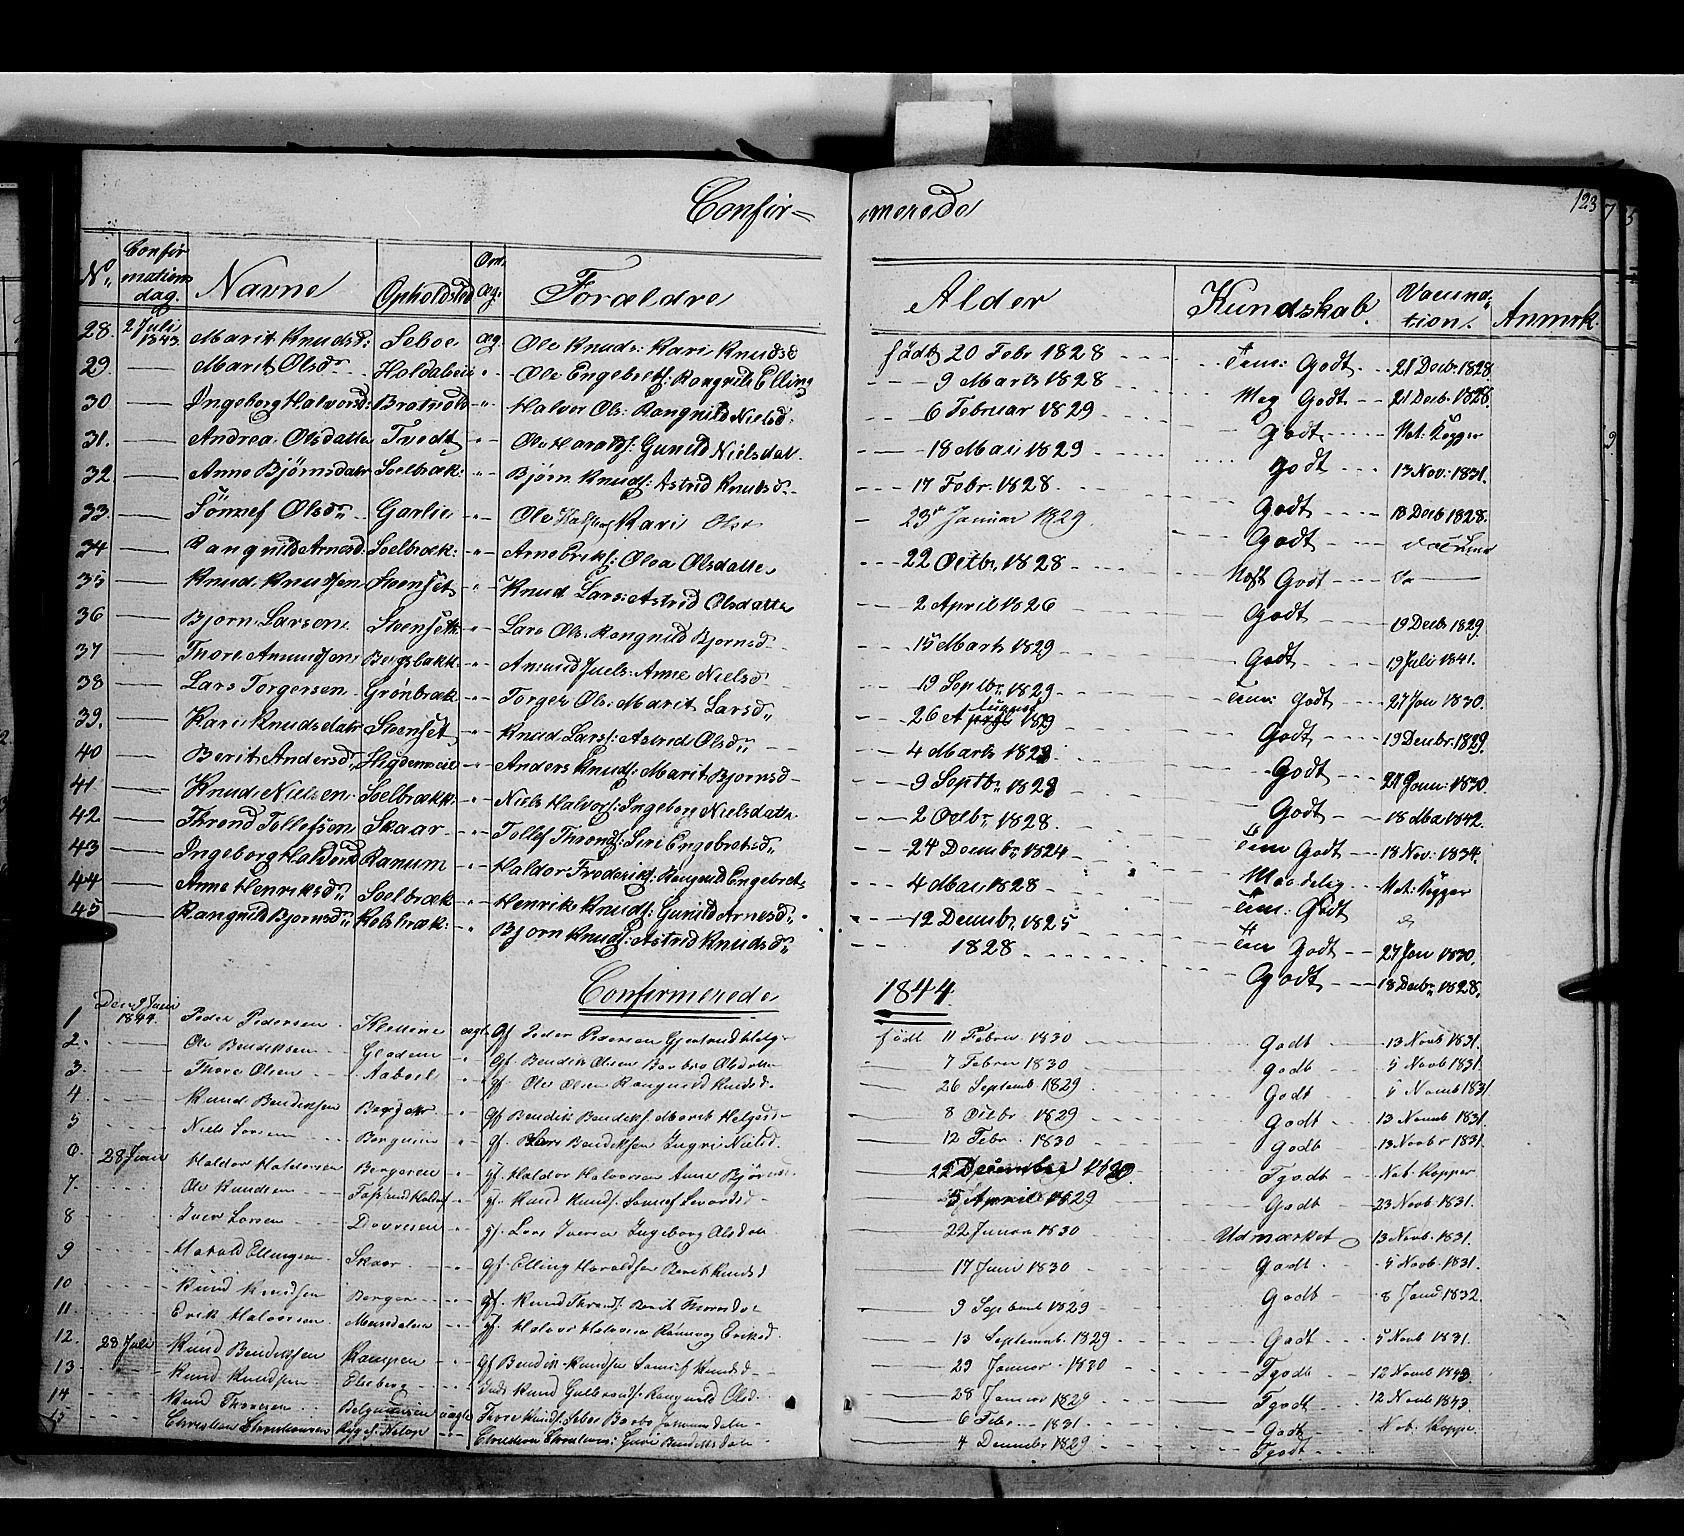 SAH, Nord-Aurdal prestekontor, Ministerialbok nr. 7, 1842-1863, s. 123